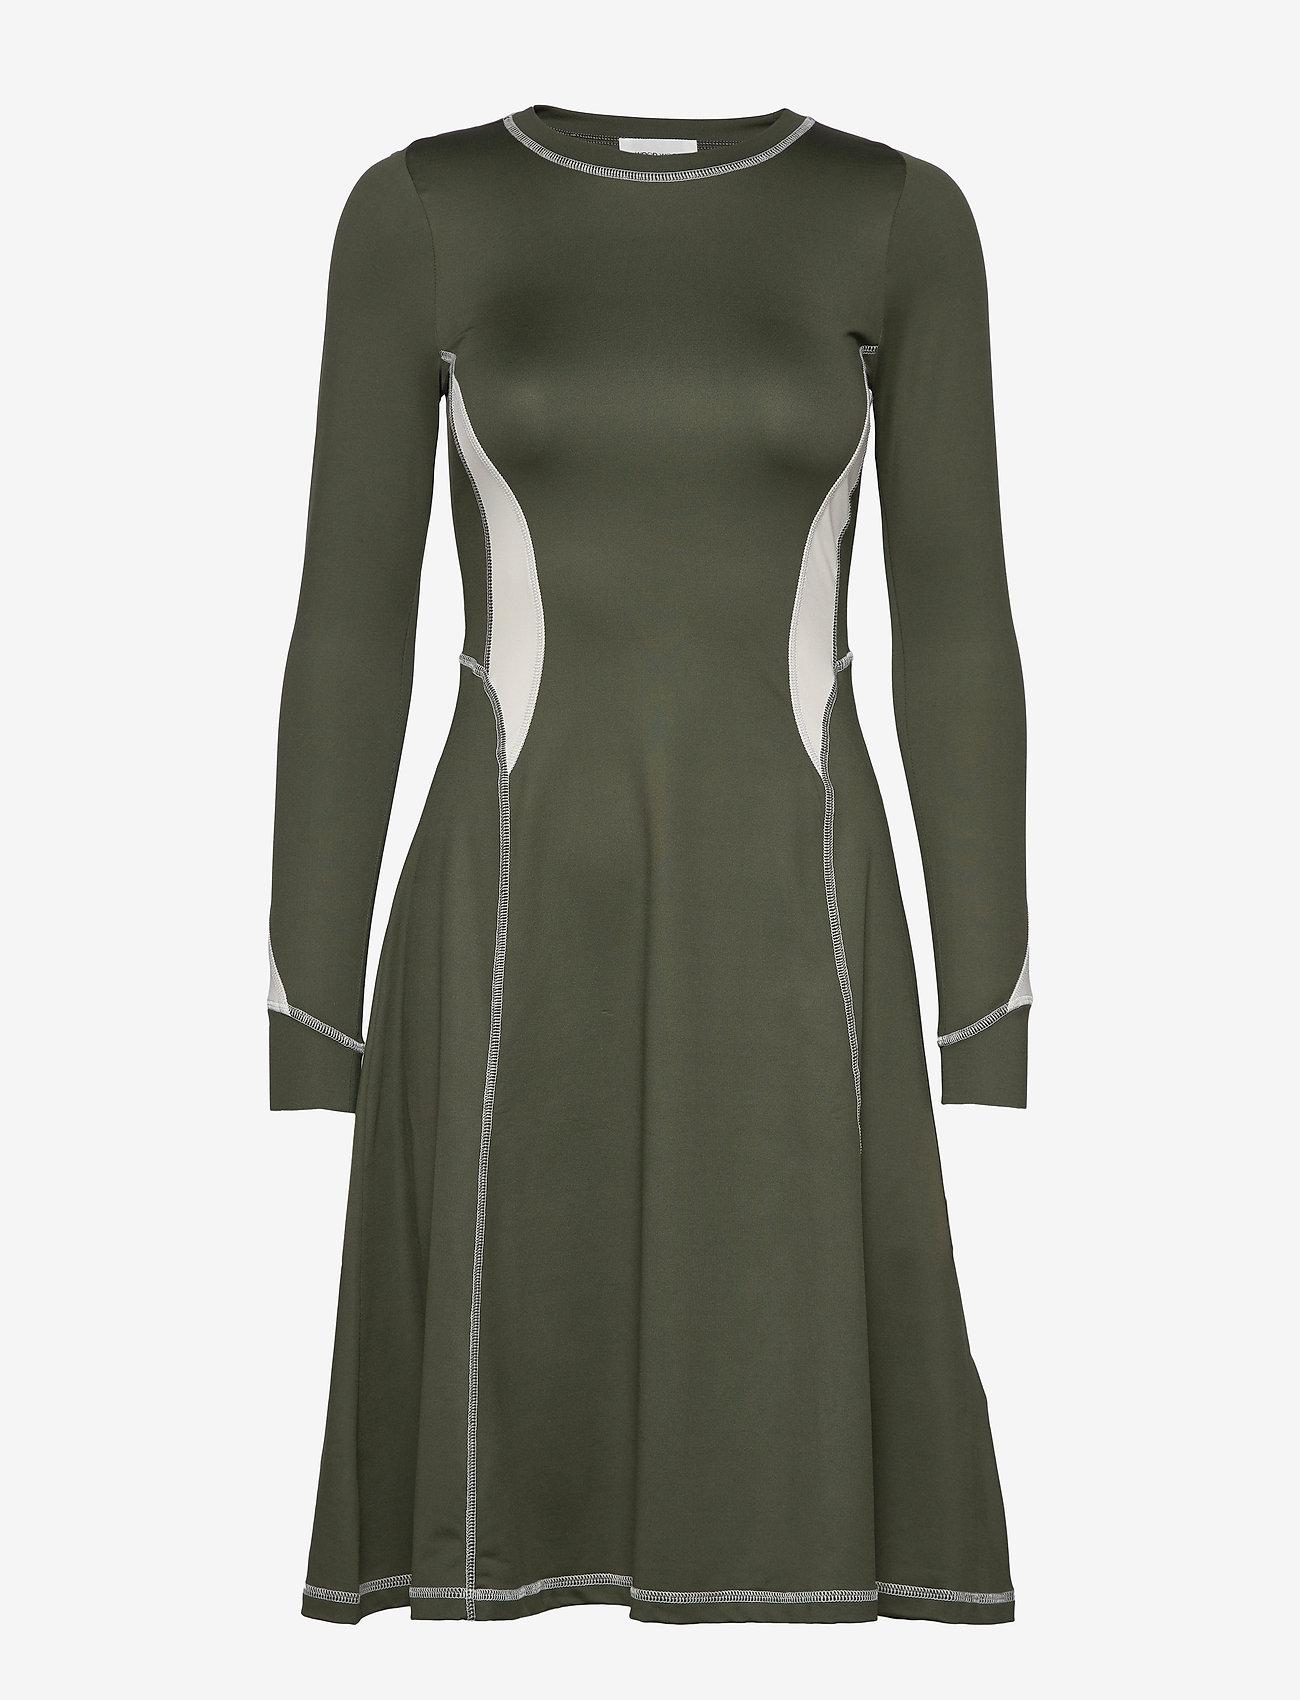 Wood Wood - Sue dress - korte kjoler - dark green - 0